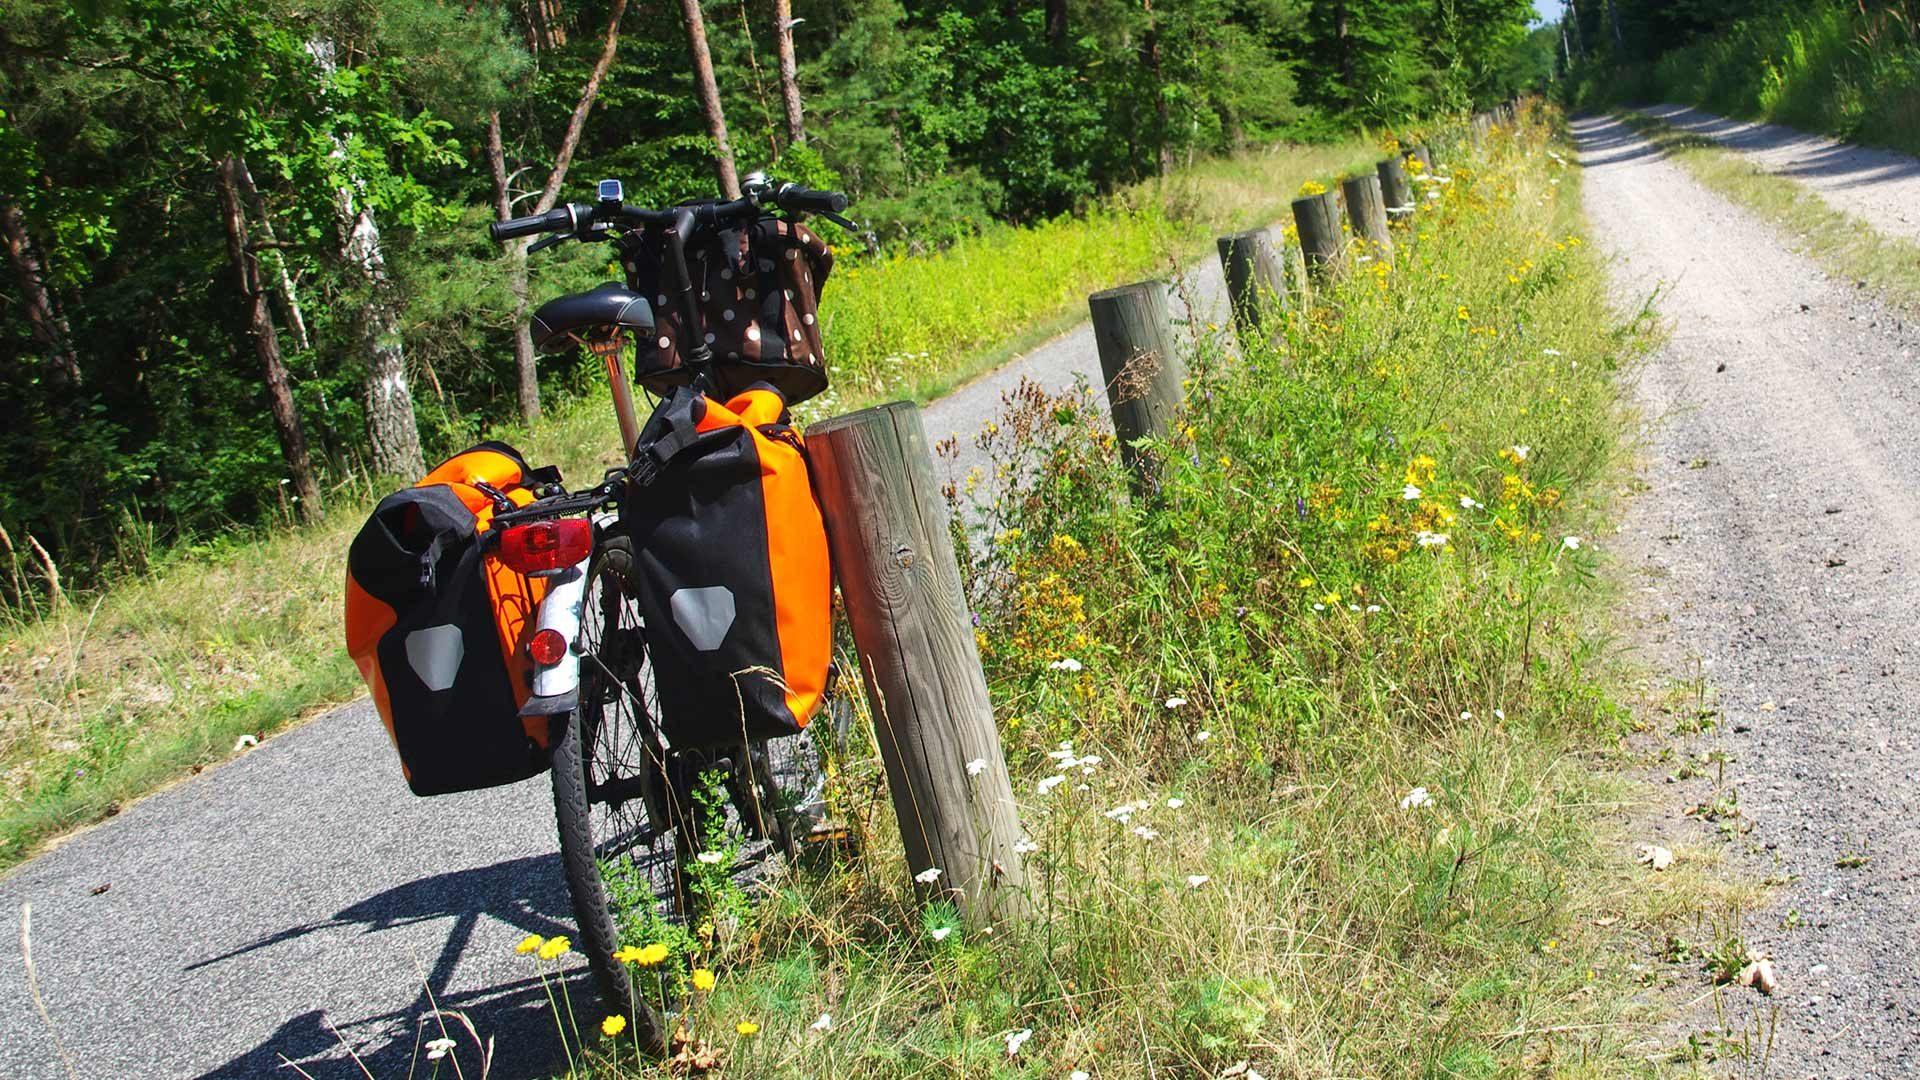 Giro in bicicletta Cermes - Foiana